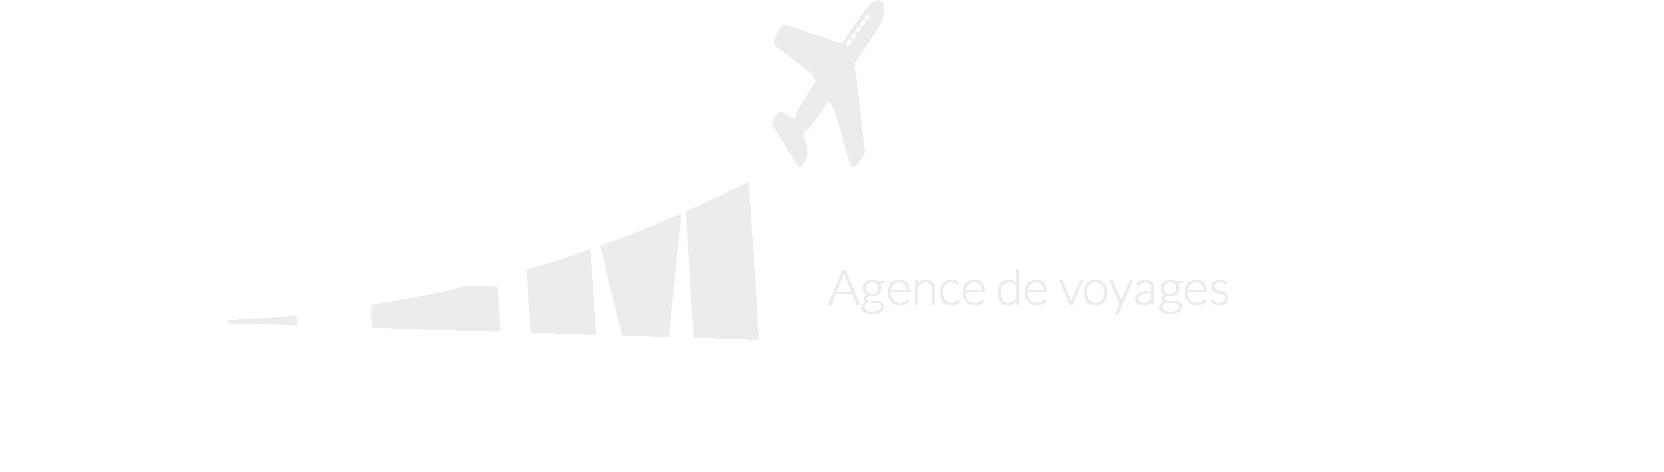 YEM Voyages